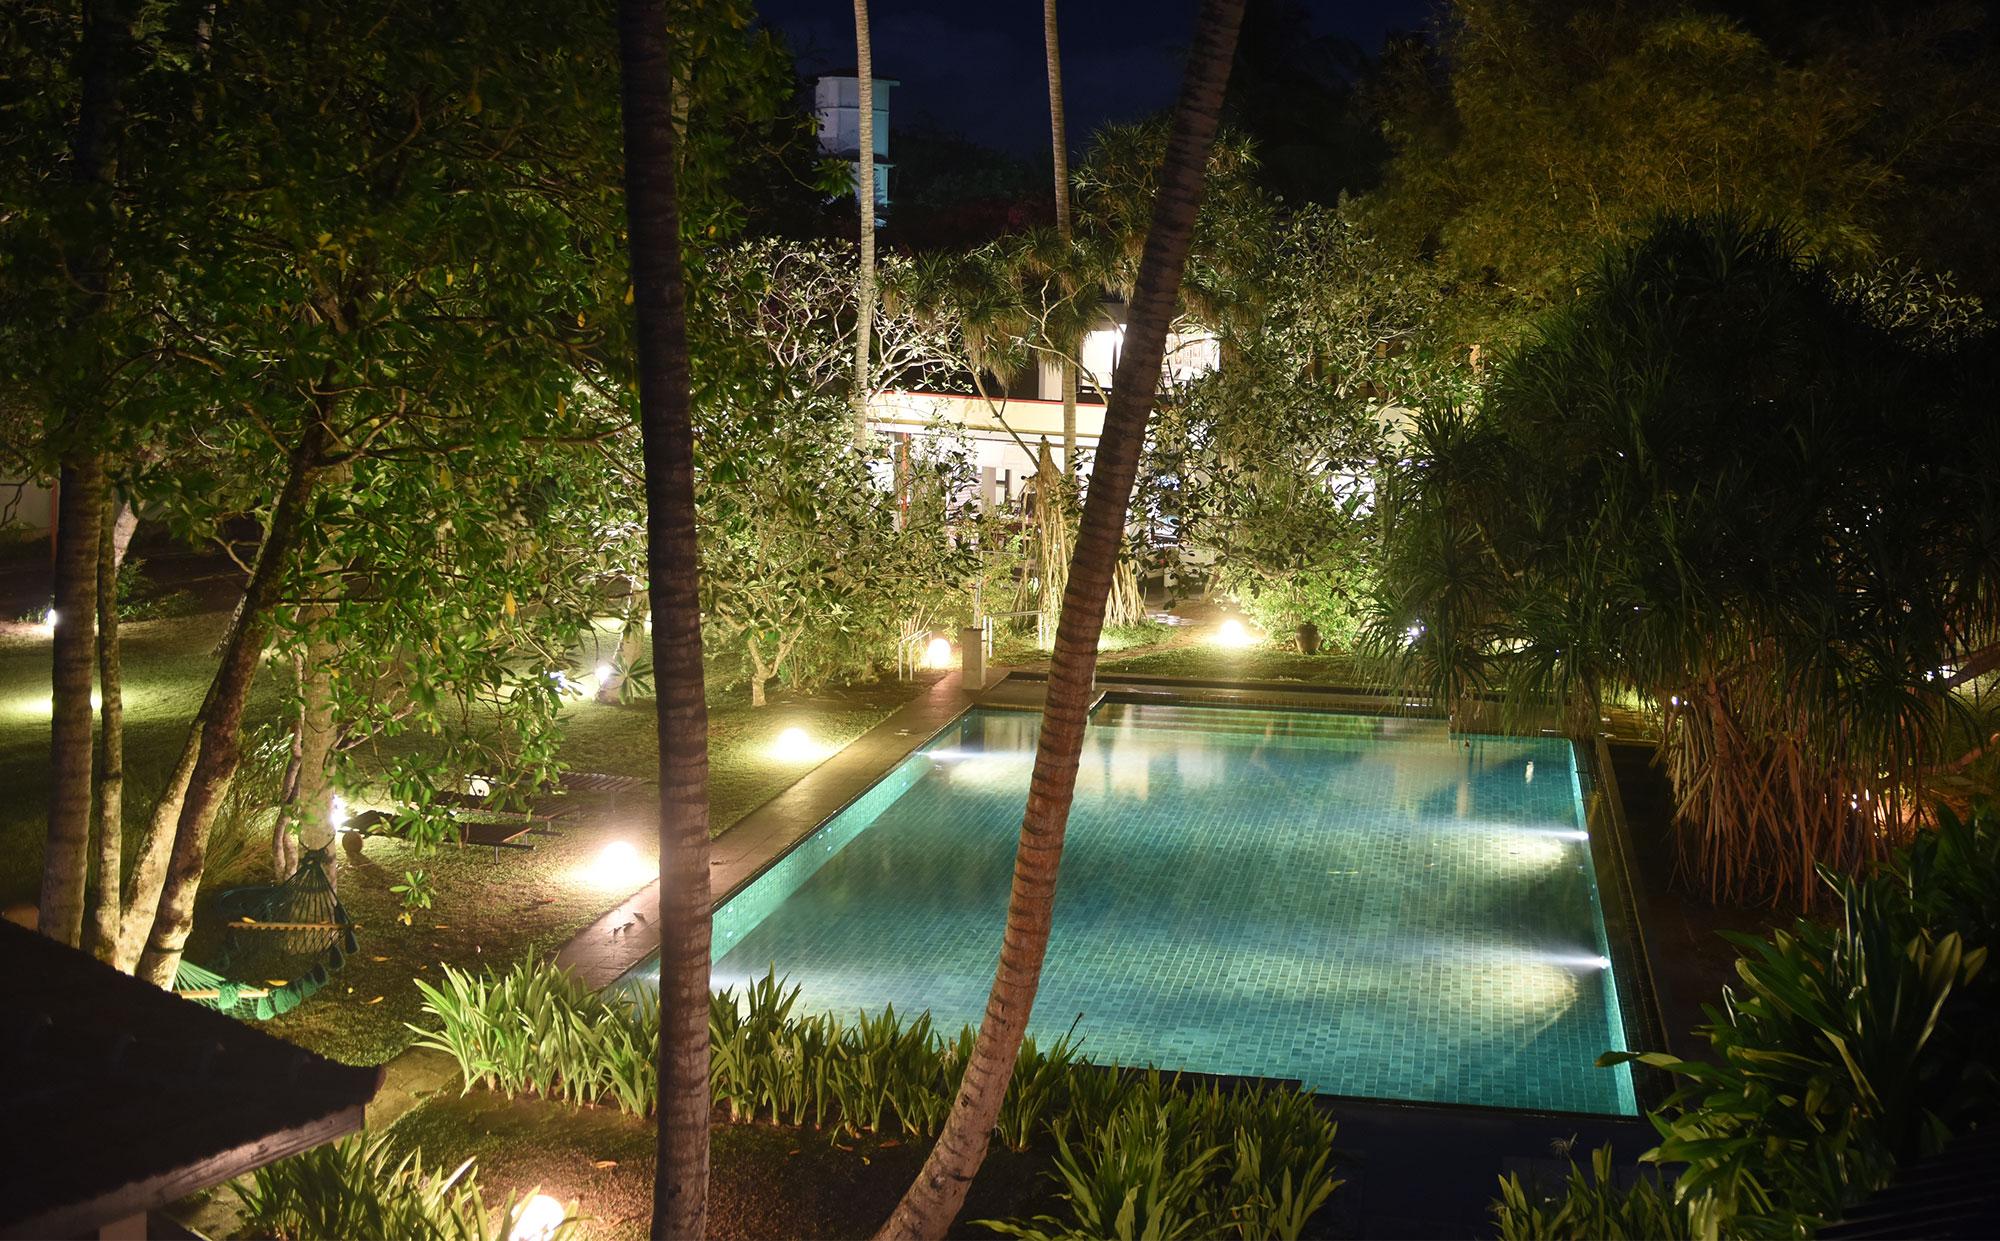 Swimmingpool im Ayurveda Resort der one world foundation in Ahungalla, Sri Lanka, Foto: Sofie Knijff